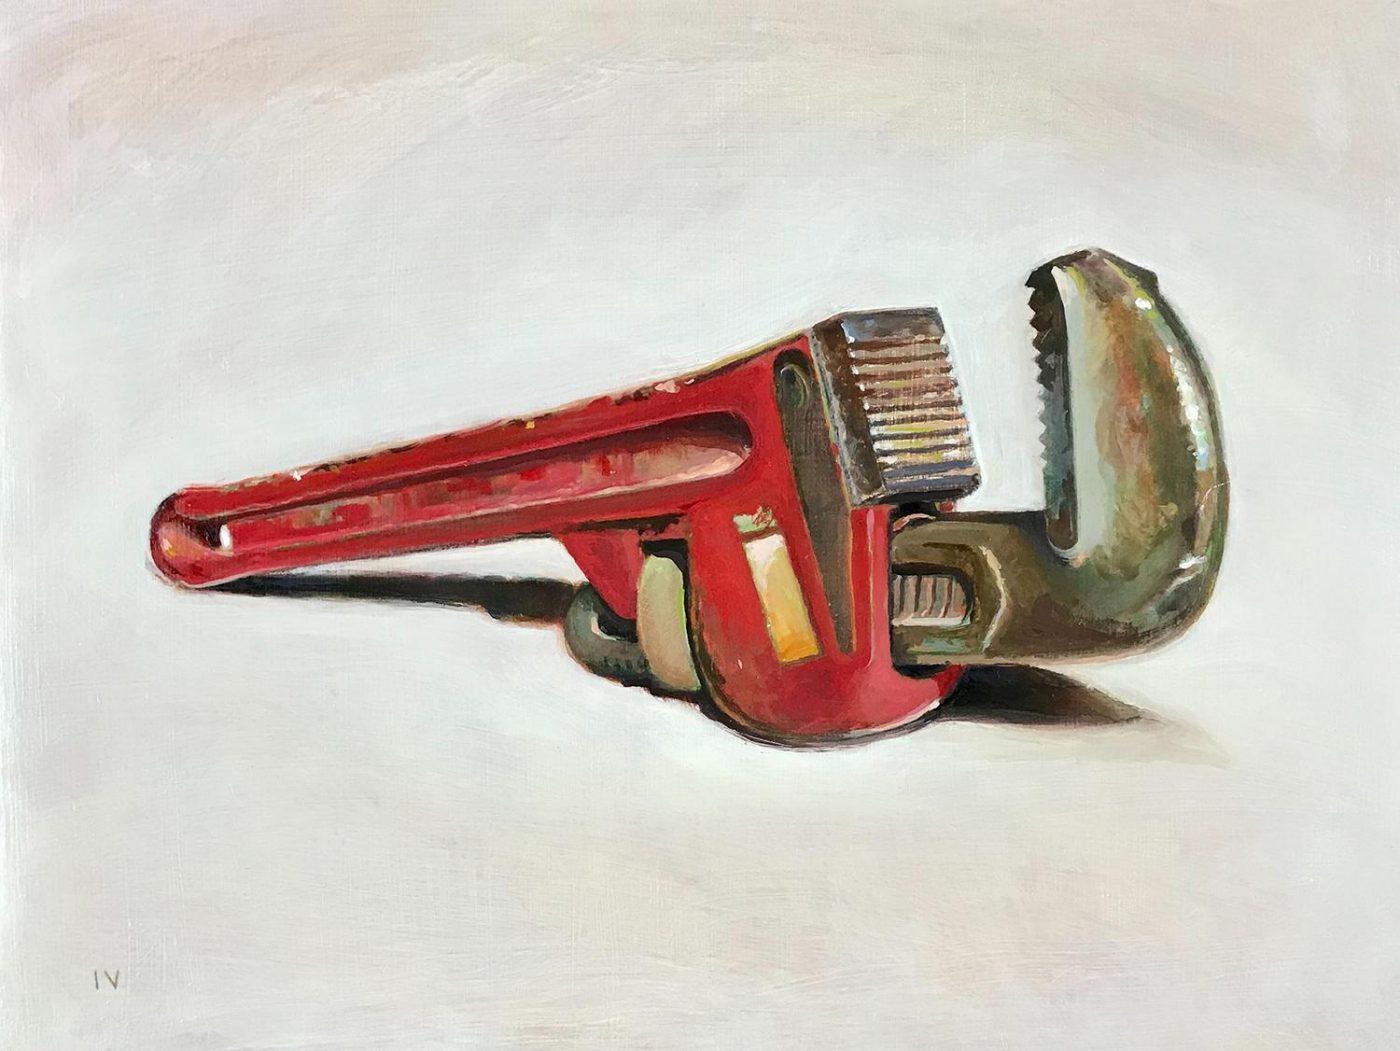 Wrench, 2020, by Matthew Hopkins